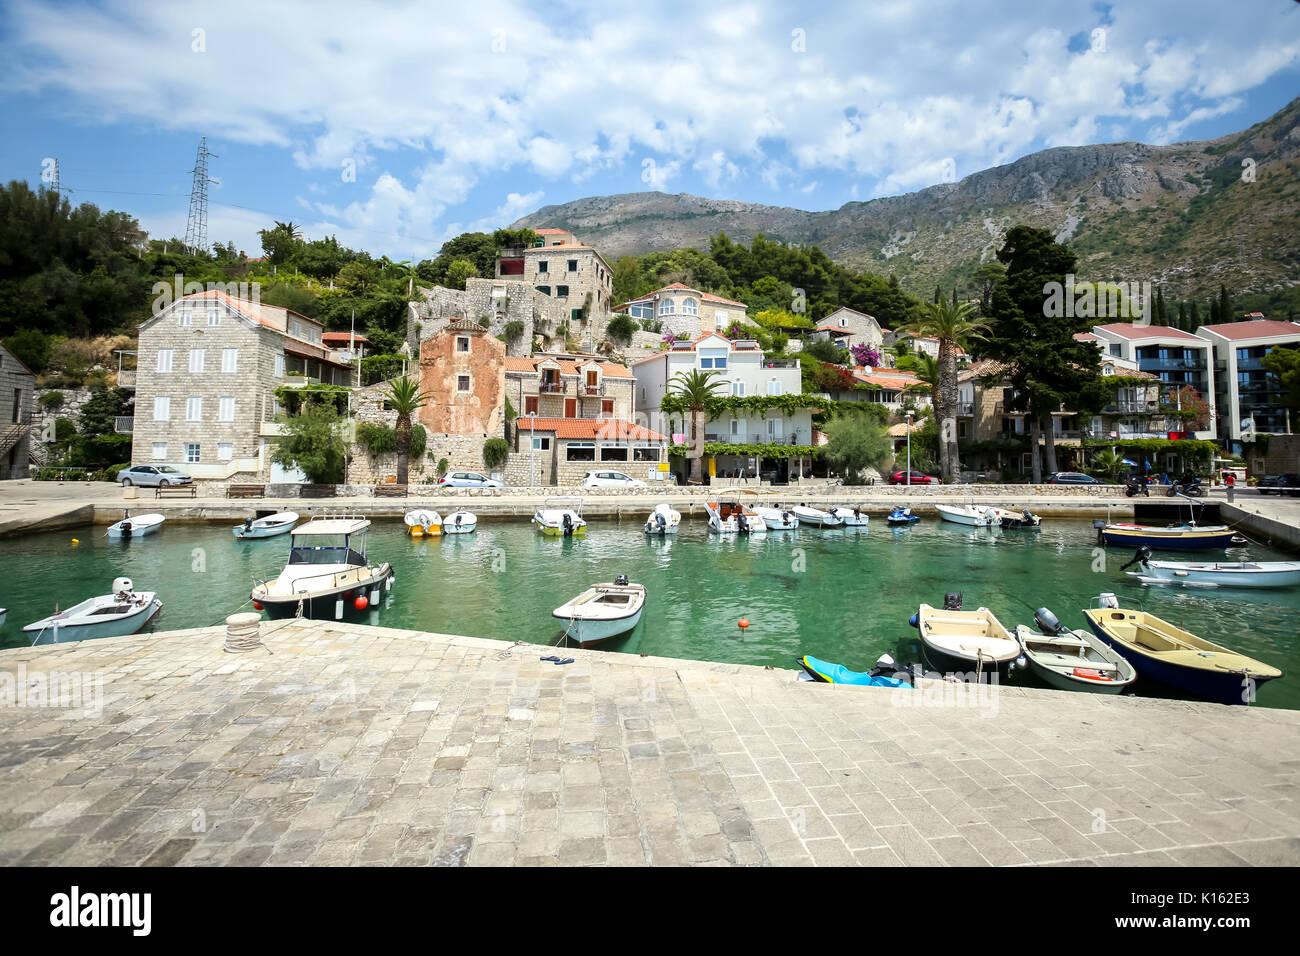 Boats anchored at pier at Dubrovnik riviera in Mlini, Croatia. - Stock Image